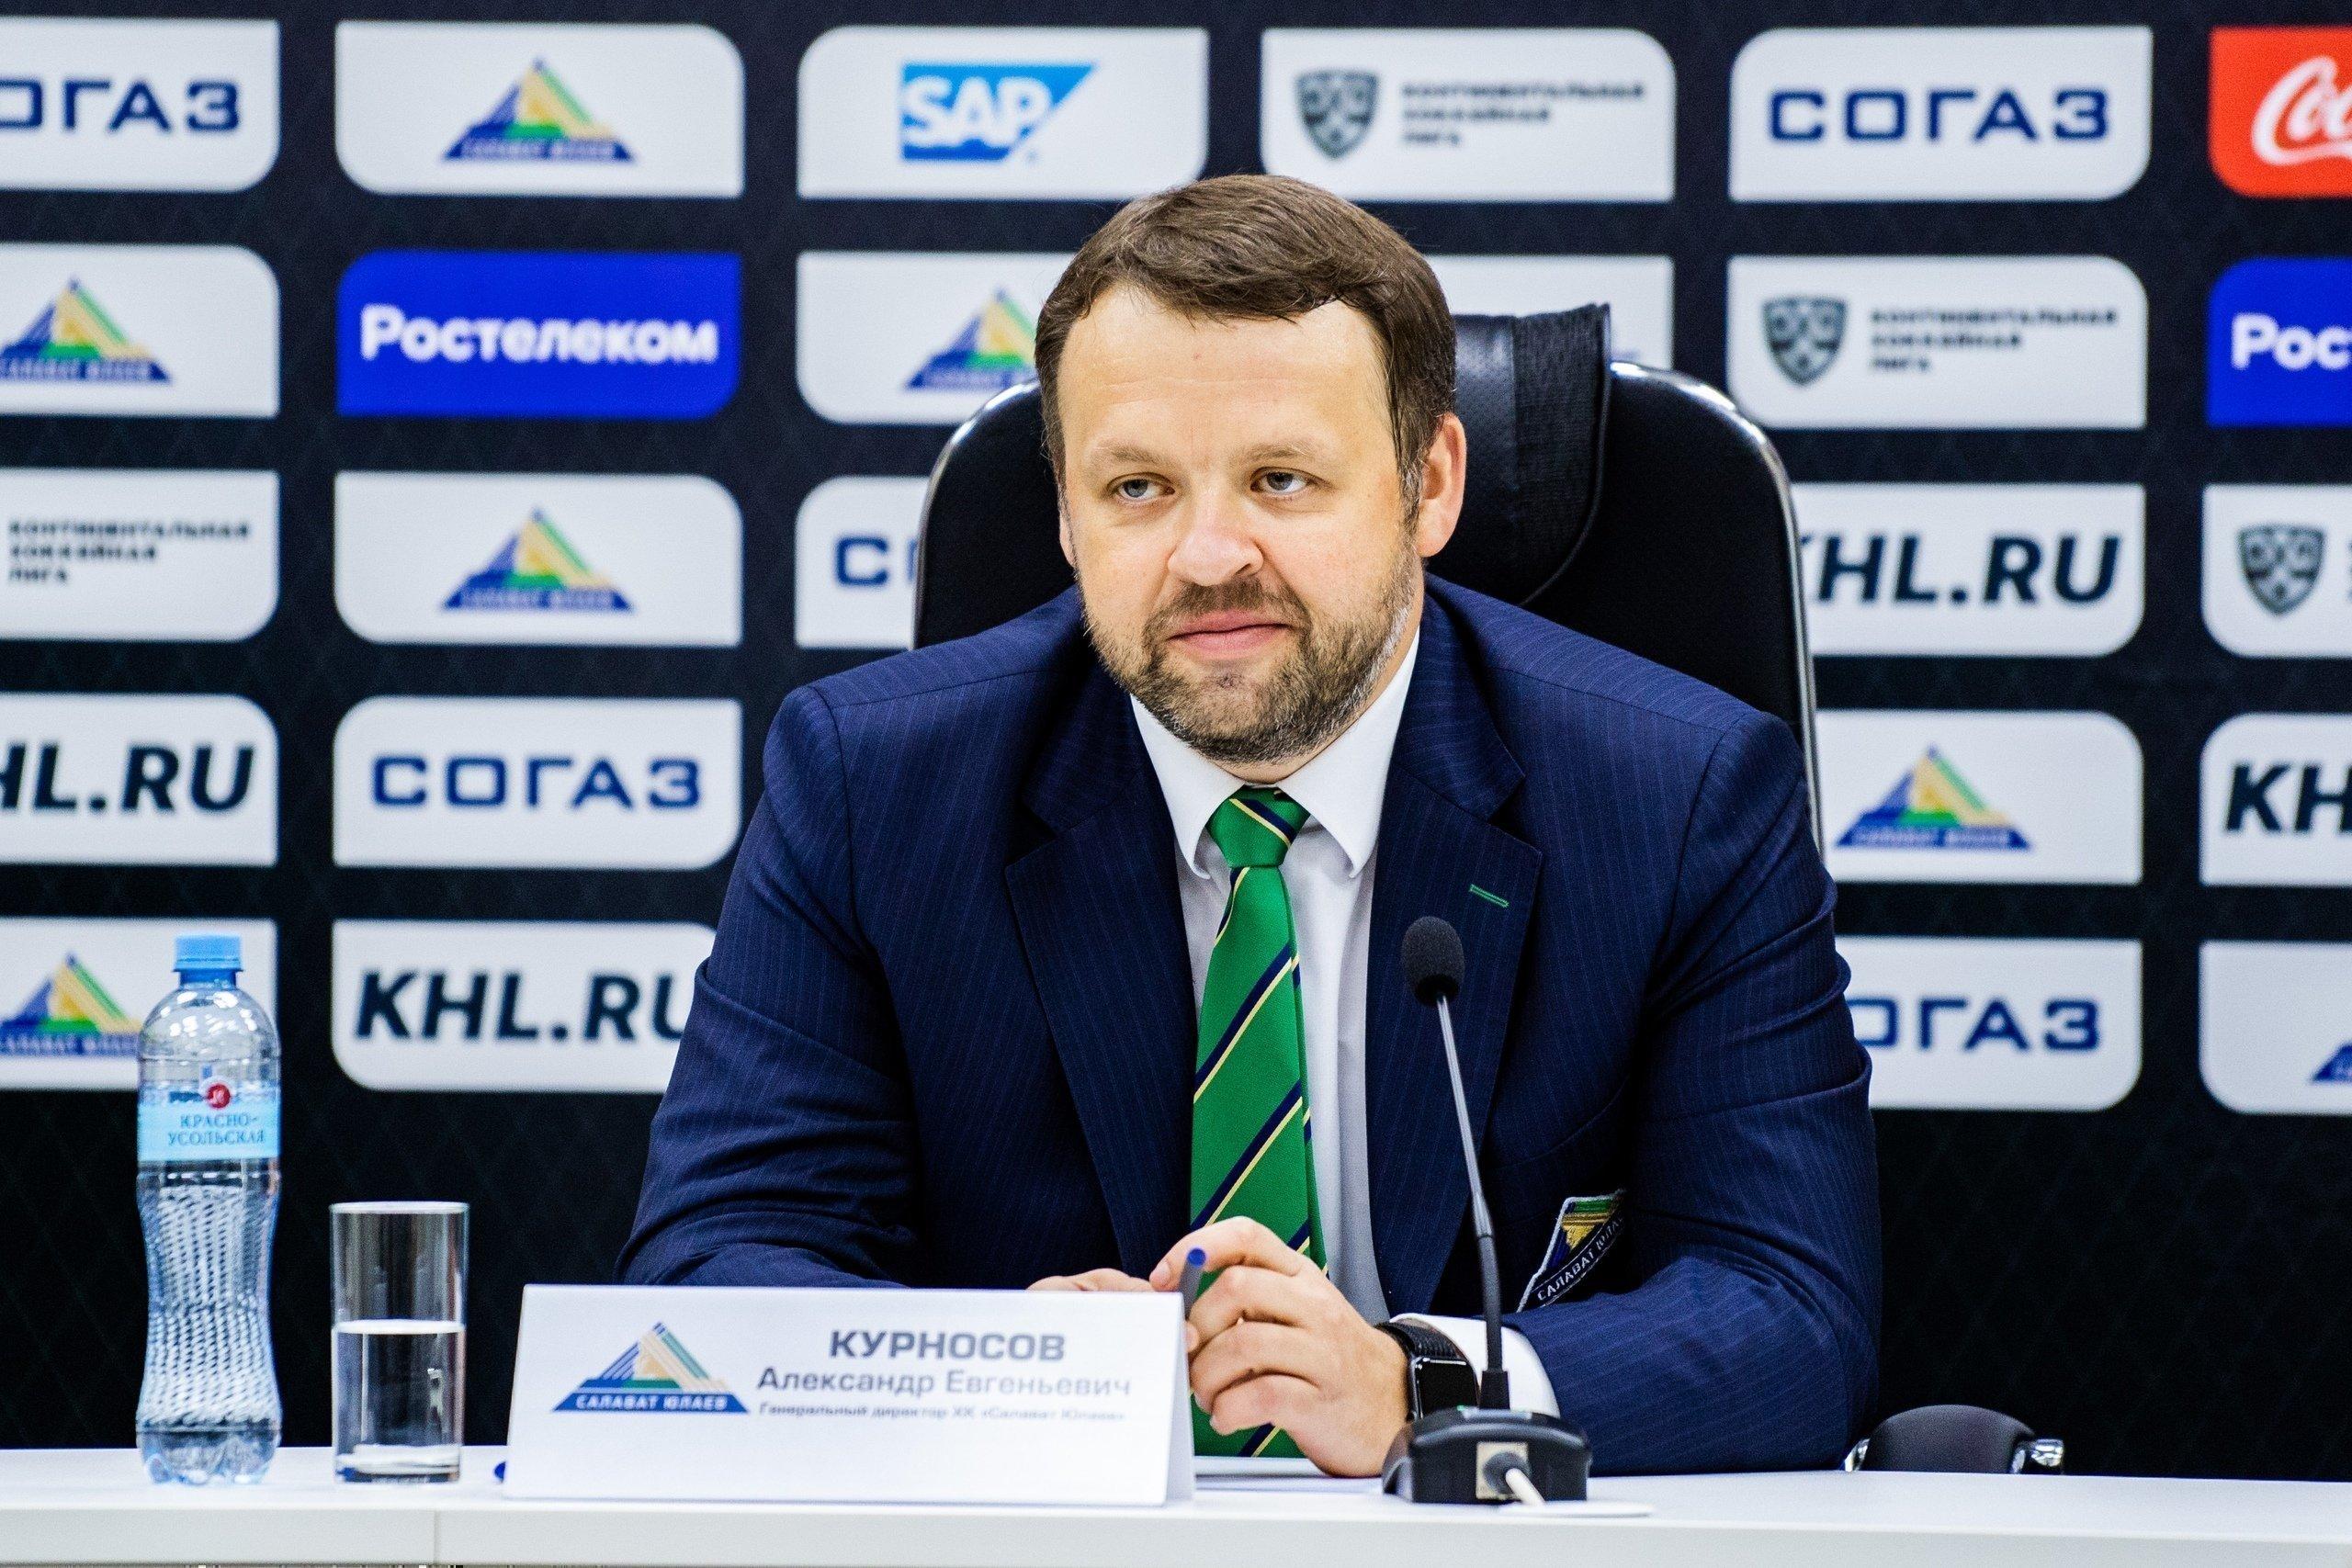 https://ss.sport-express.ru/userfiles/materials/151/1514504/origin_b8898aad.jpg